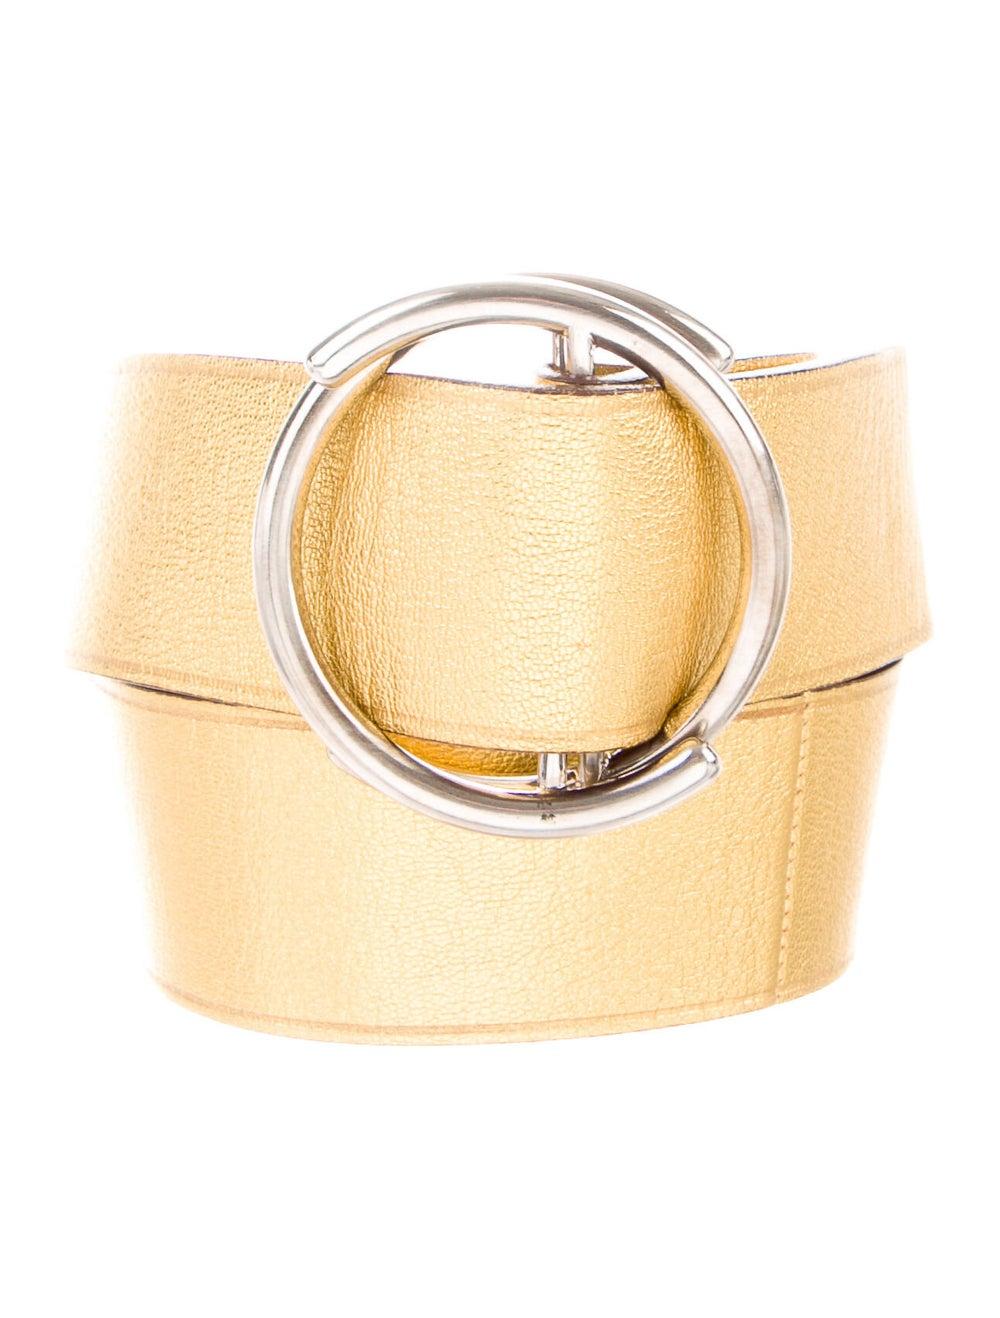 Prada Leather Belt Gold - image 1